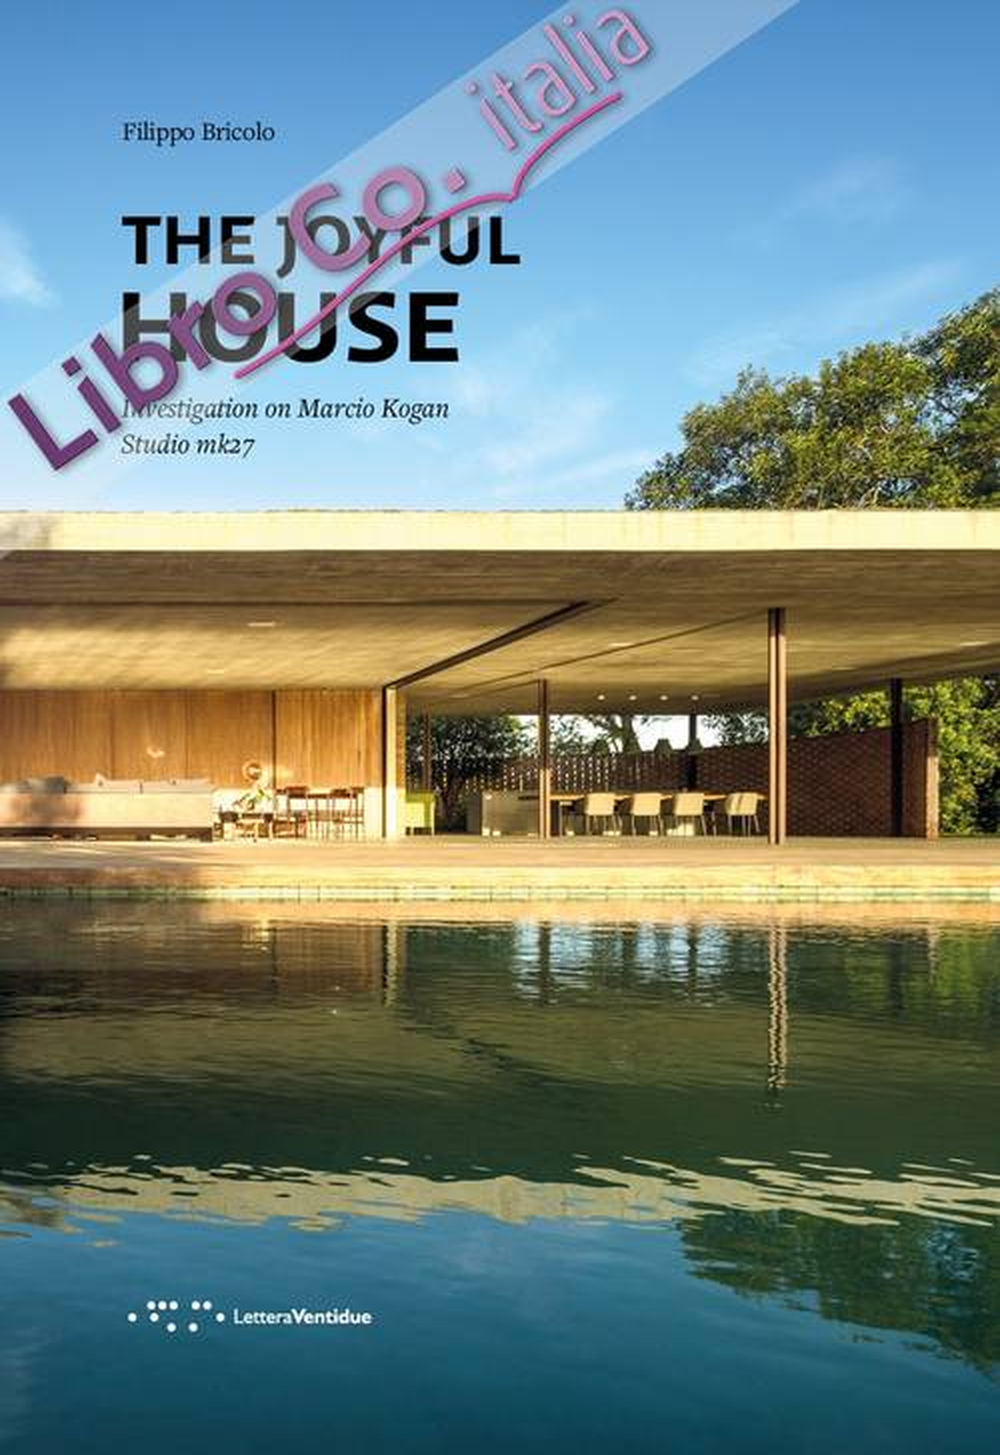 The Joyful House.